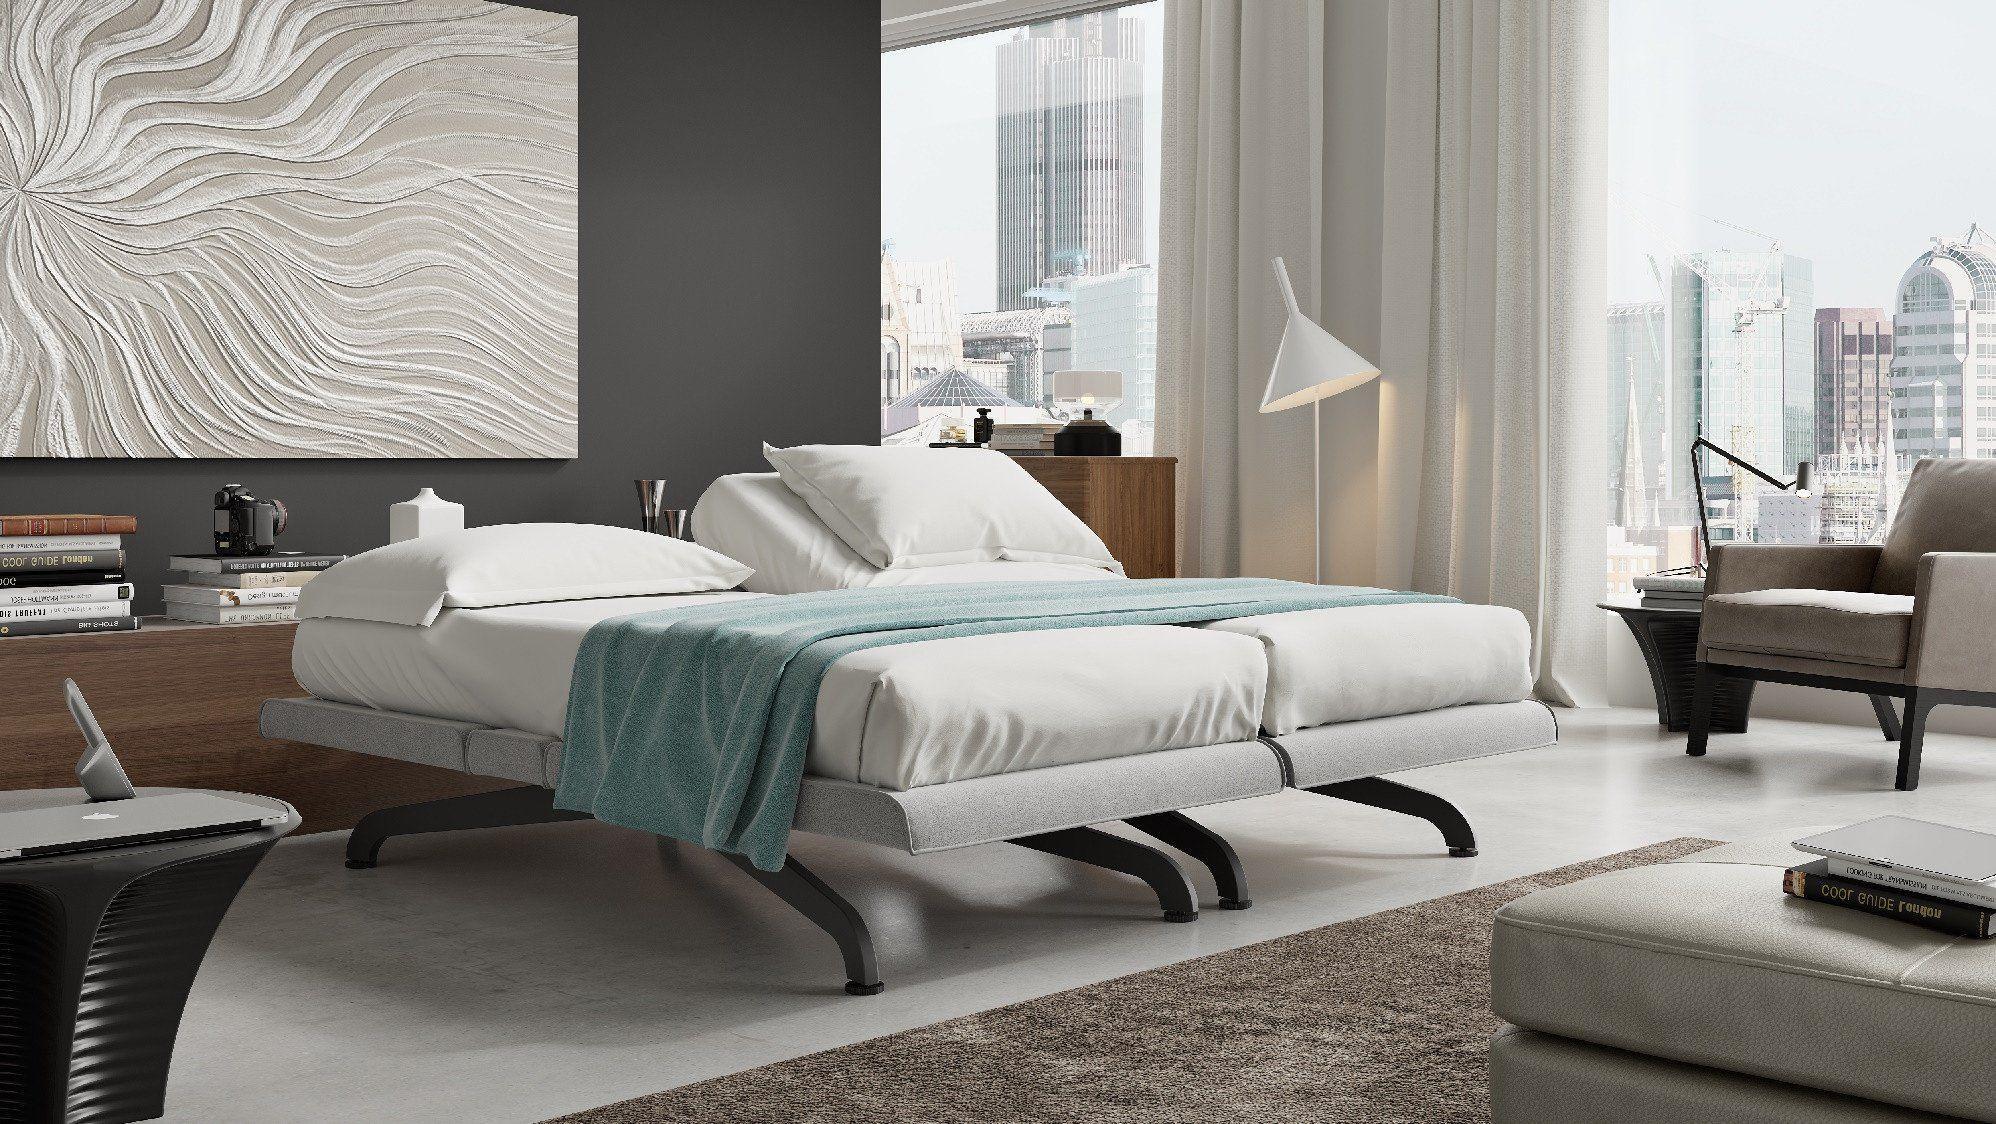 the quadro ergonomic adjustable bed by hollandia sleep